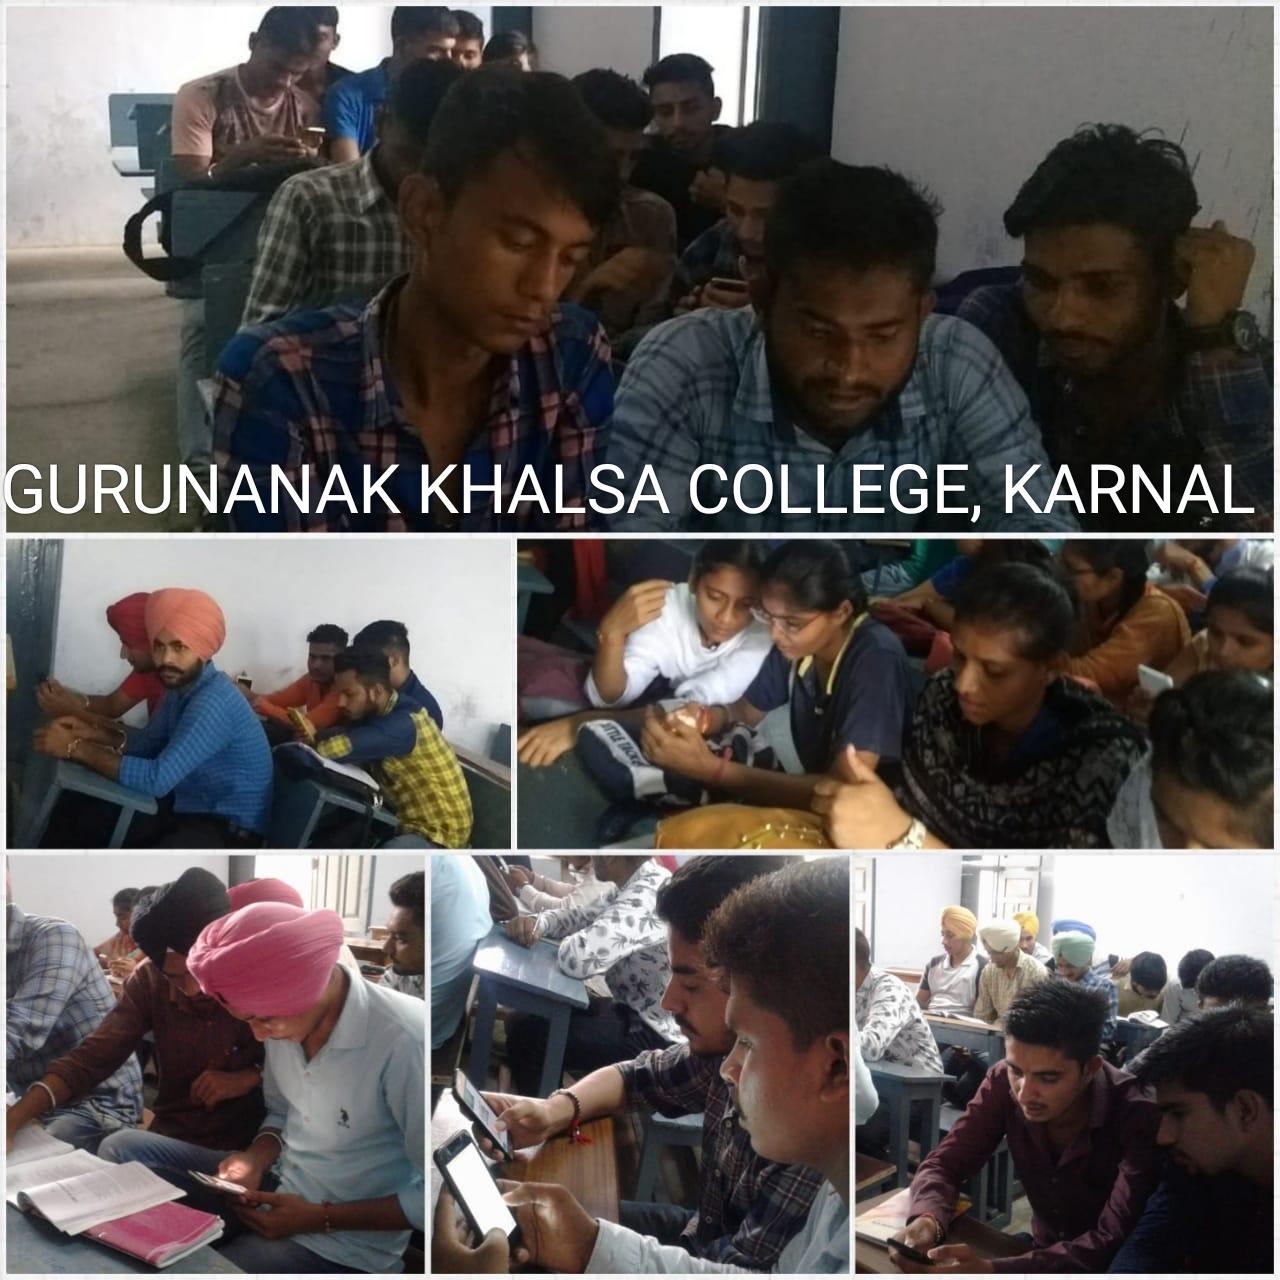 gurunanak Khalsa College karnal.jpeg